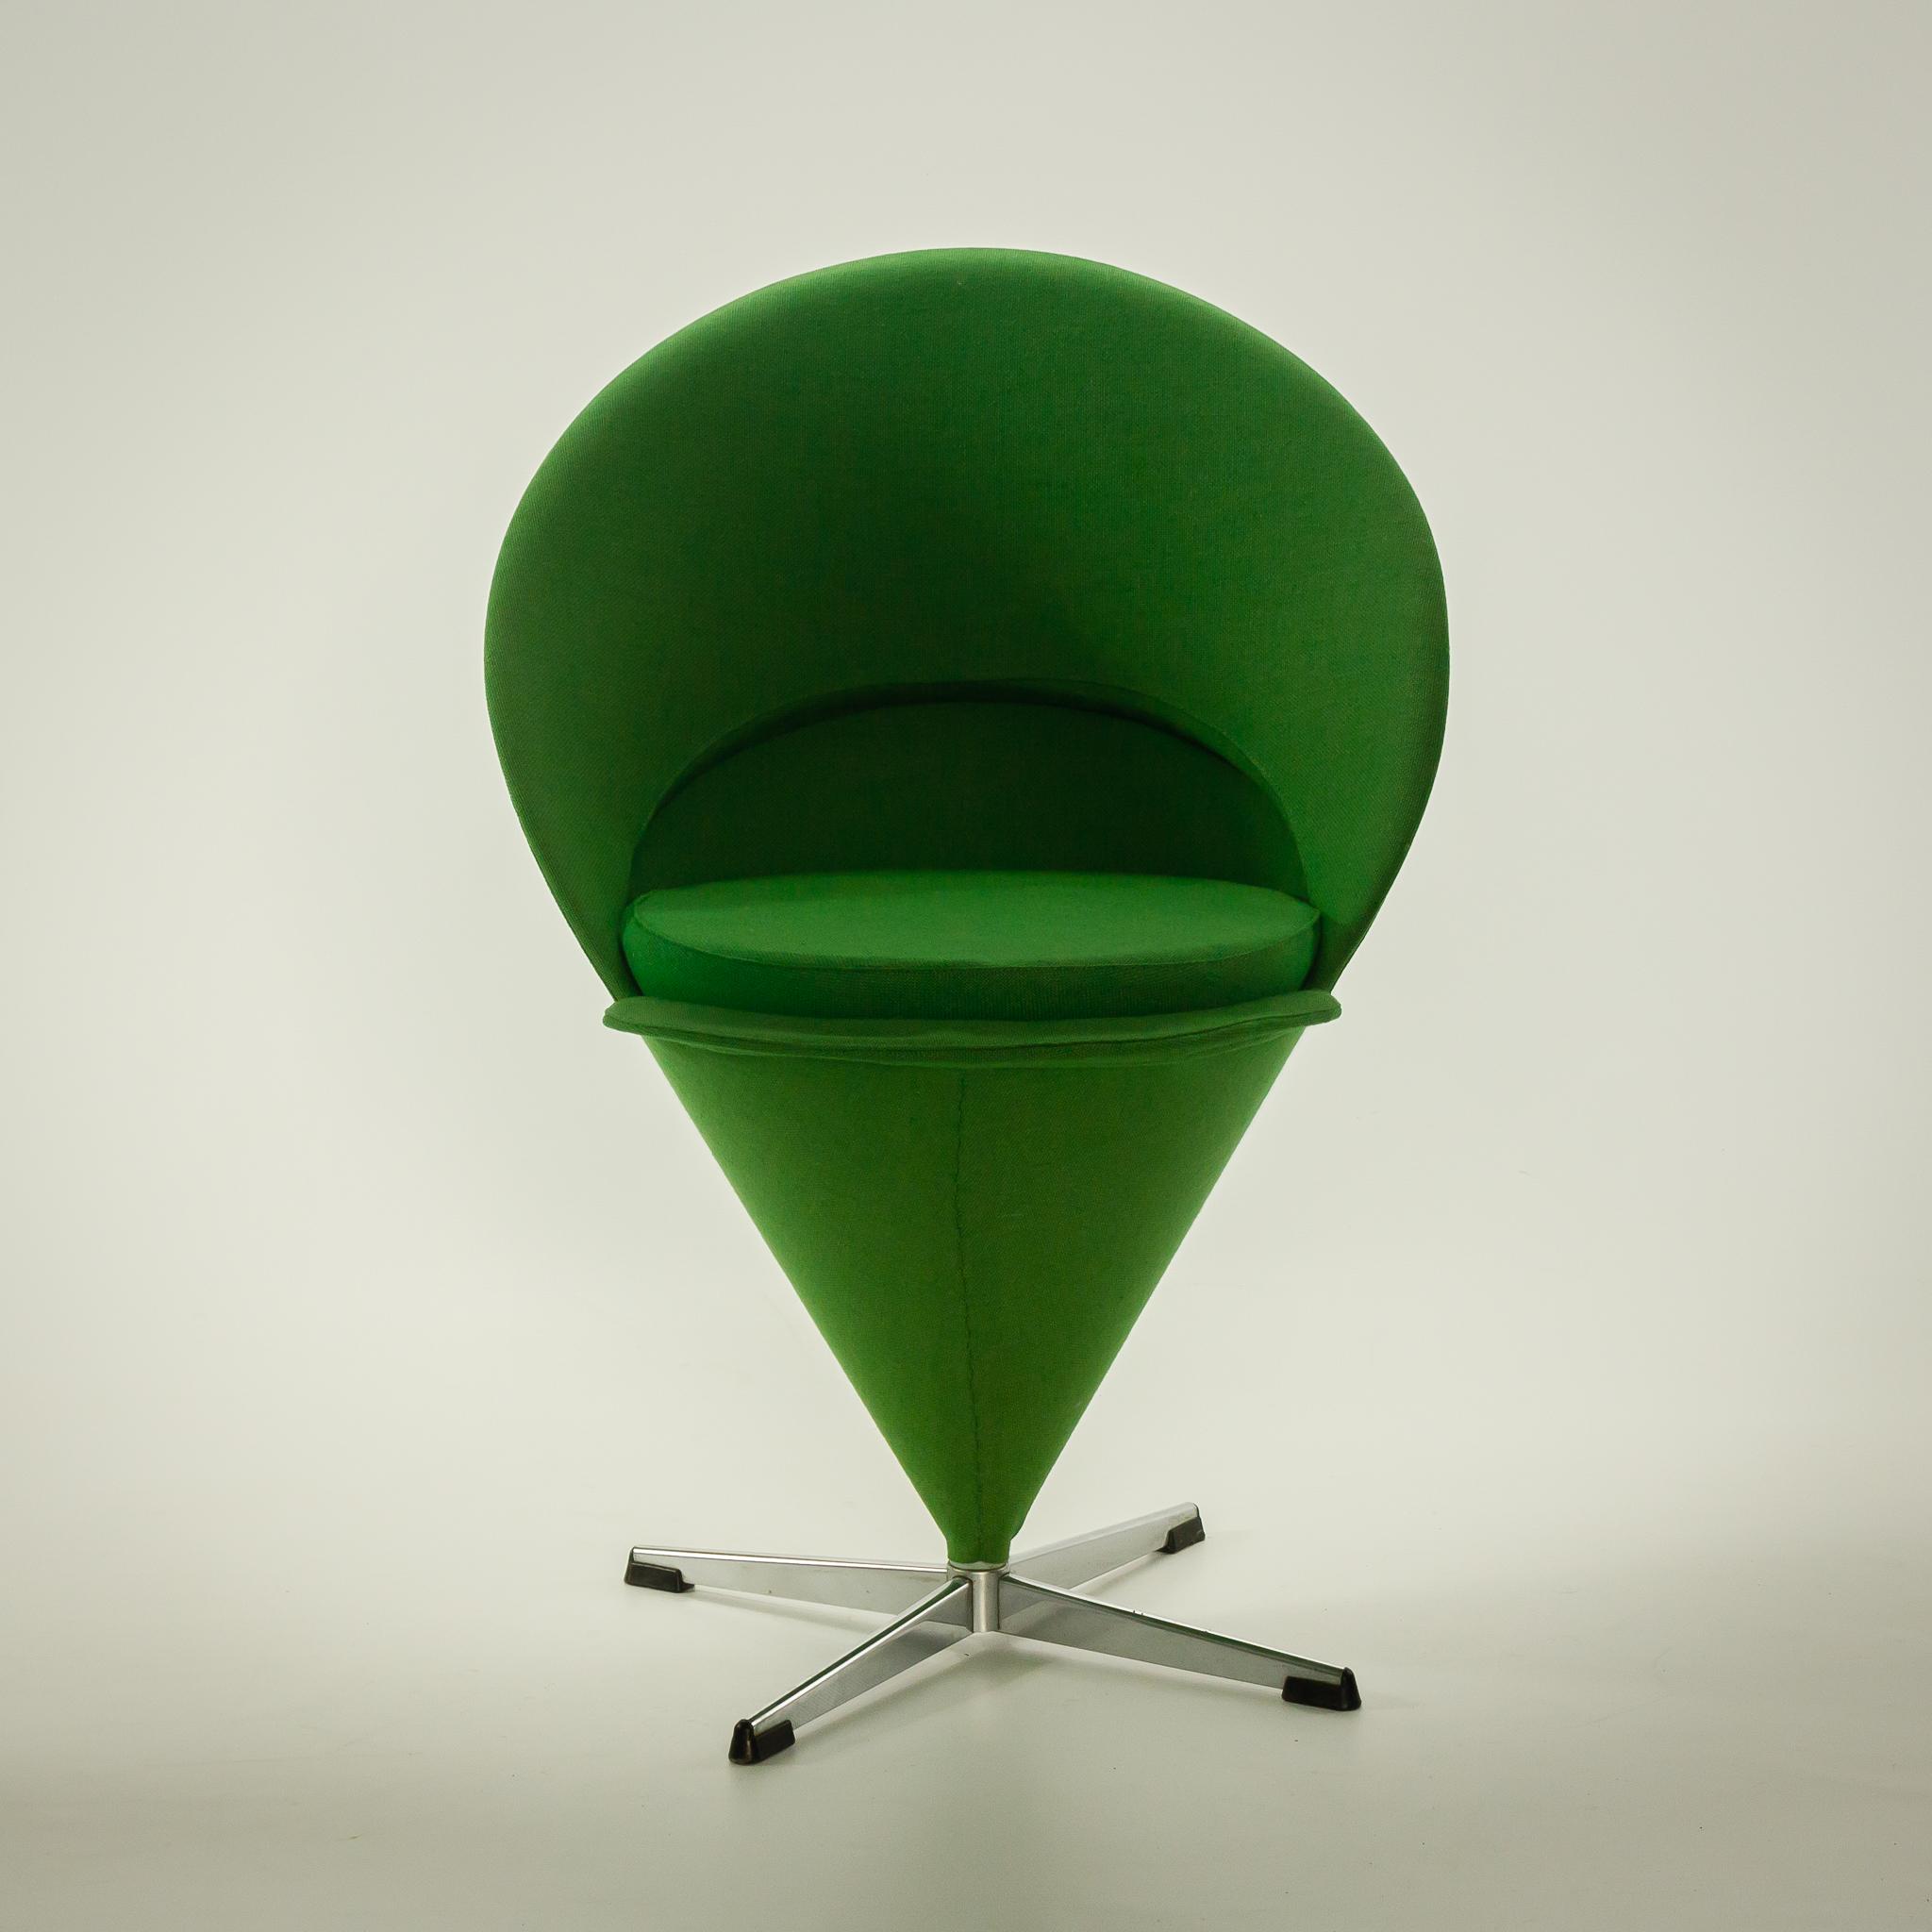 50 s verner panton cone chair draai stoel plus linje barbmama. Black Bedroom Furniture Sets. Home Design Ideas